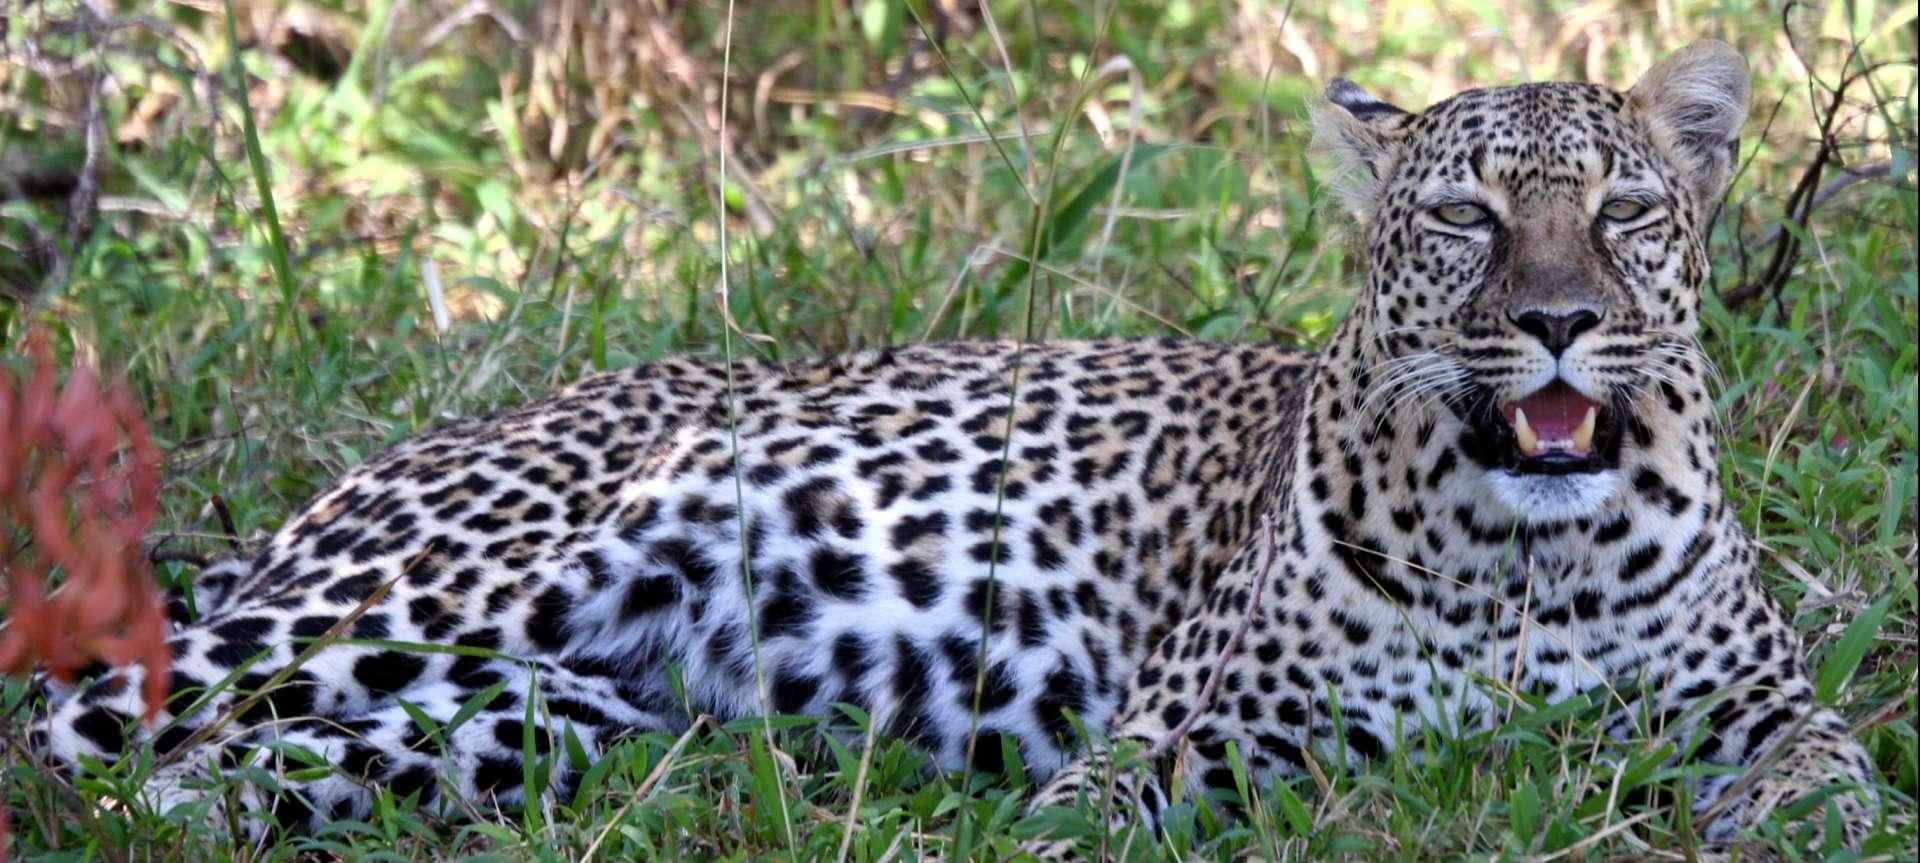 Leopard safaris in Africa - Africa Wildlife Safaris